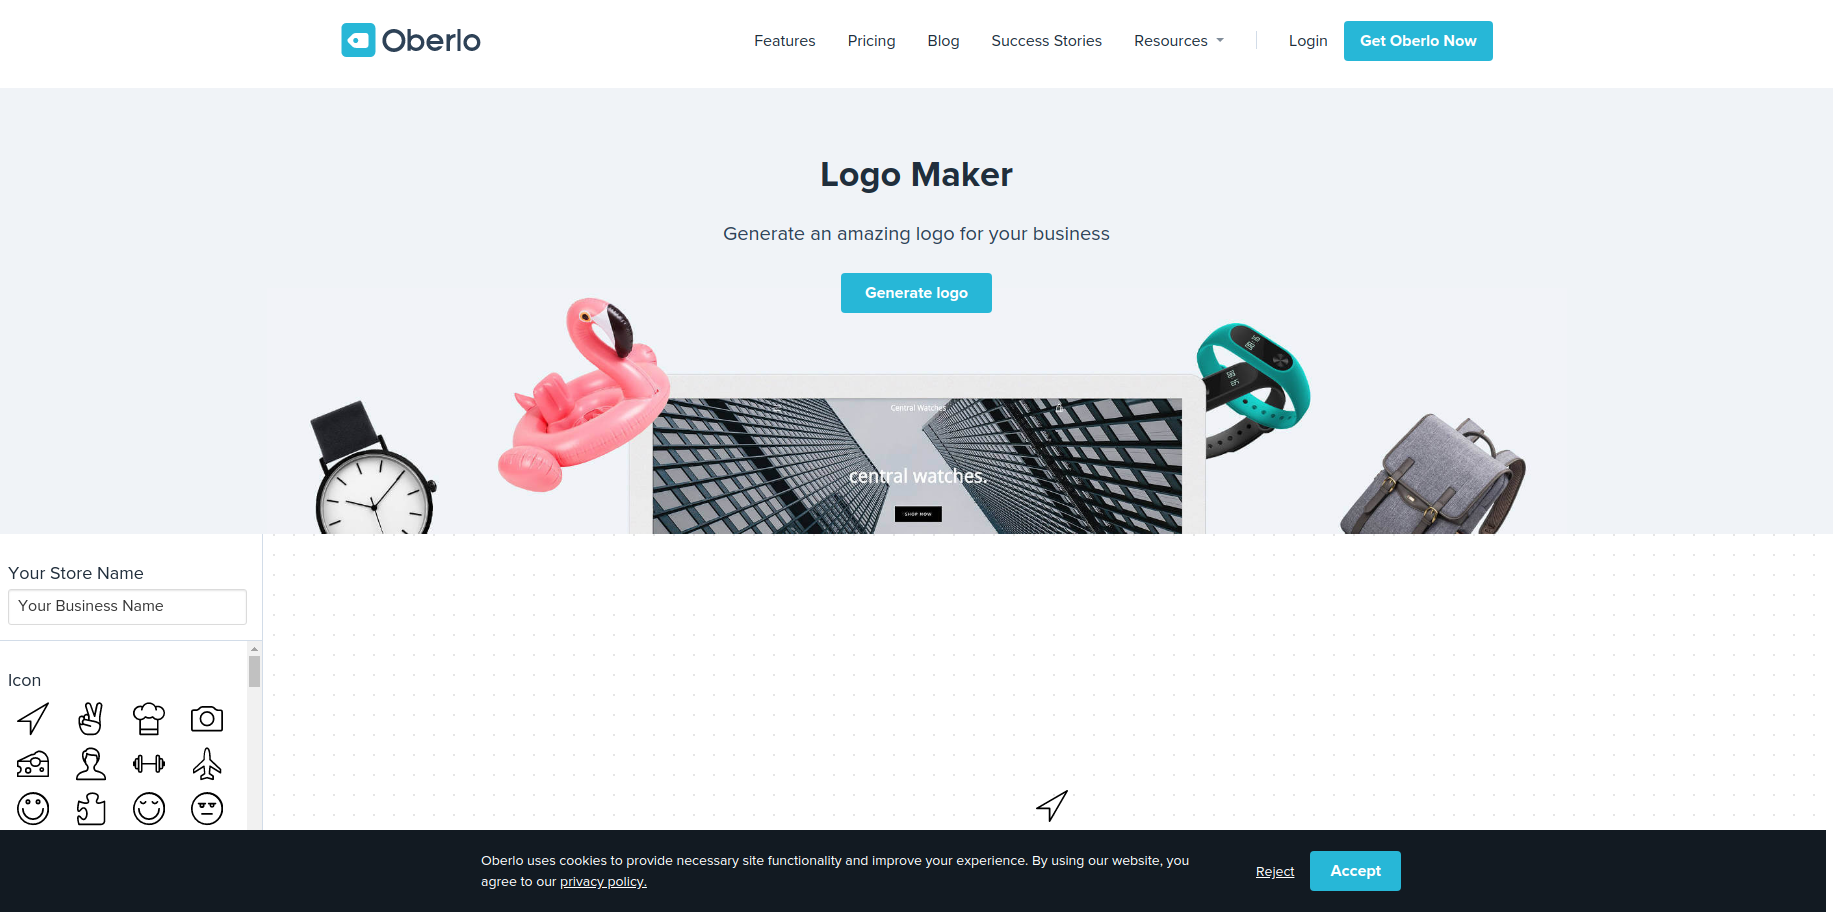 oberlo logo creator free logo maker software